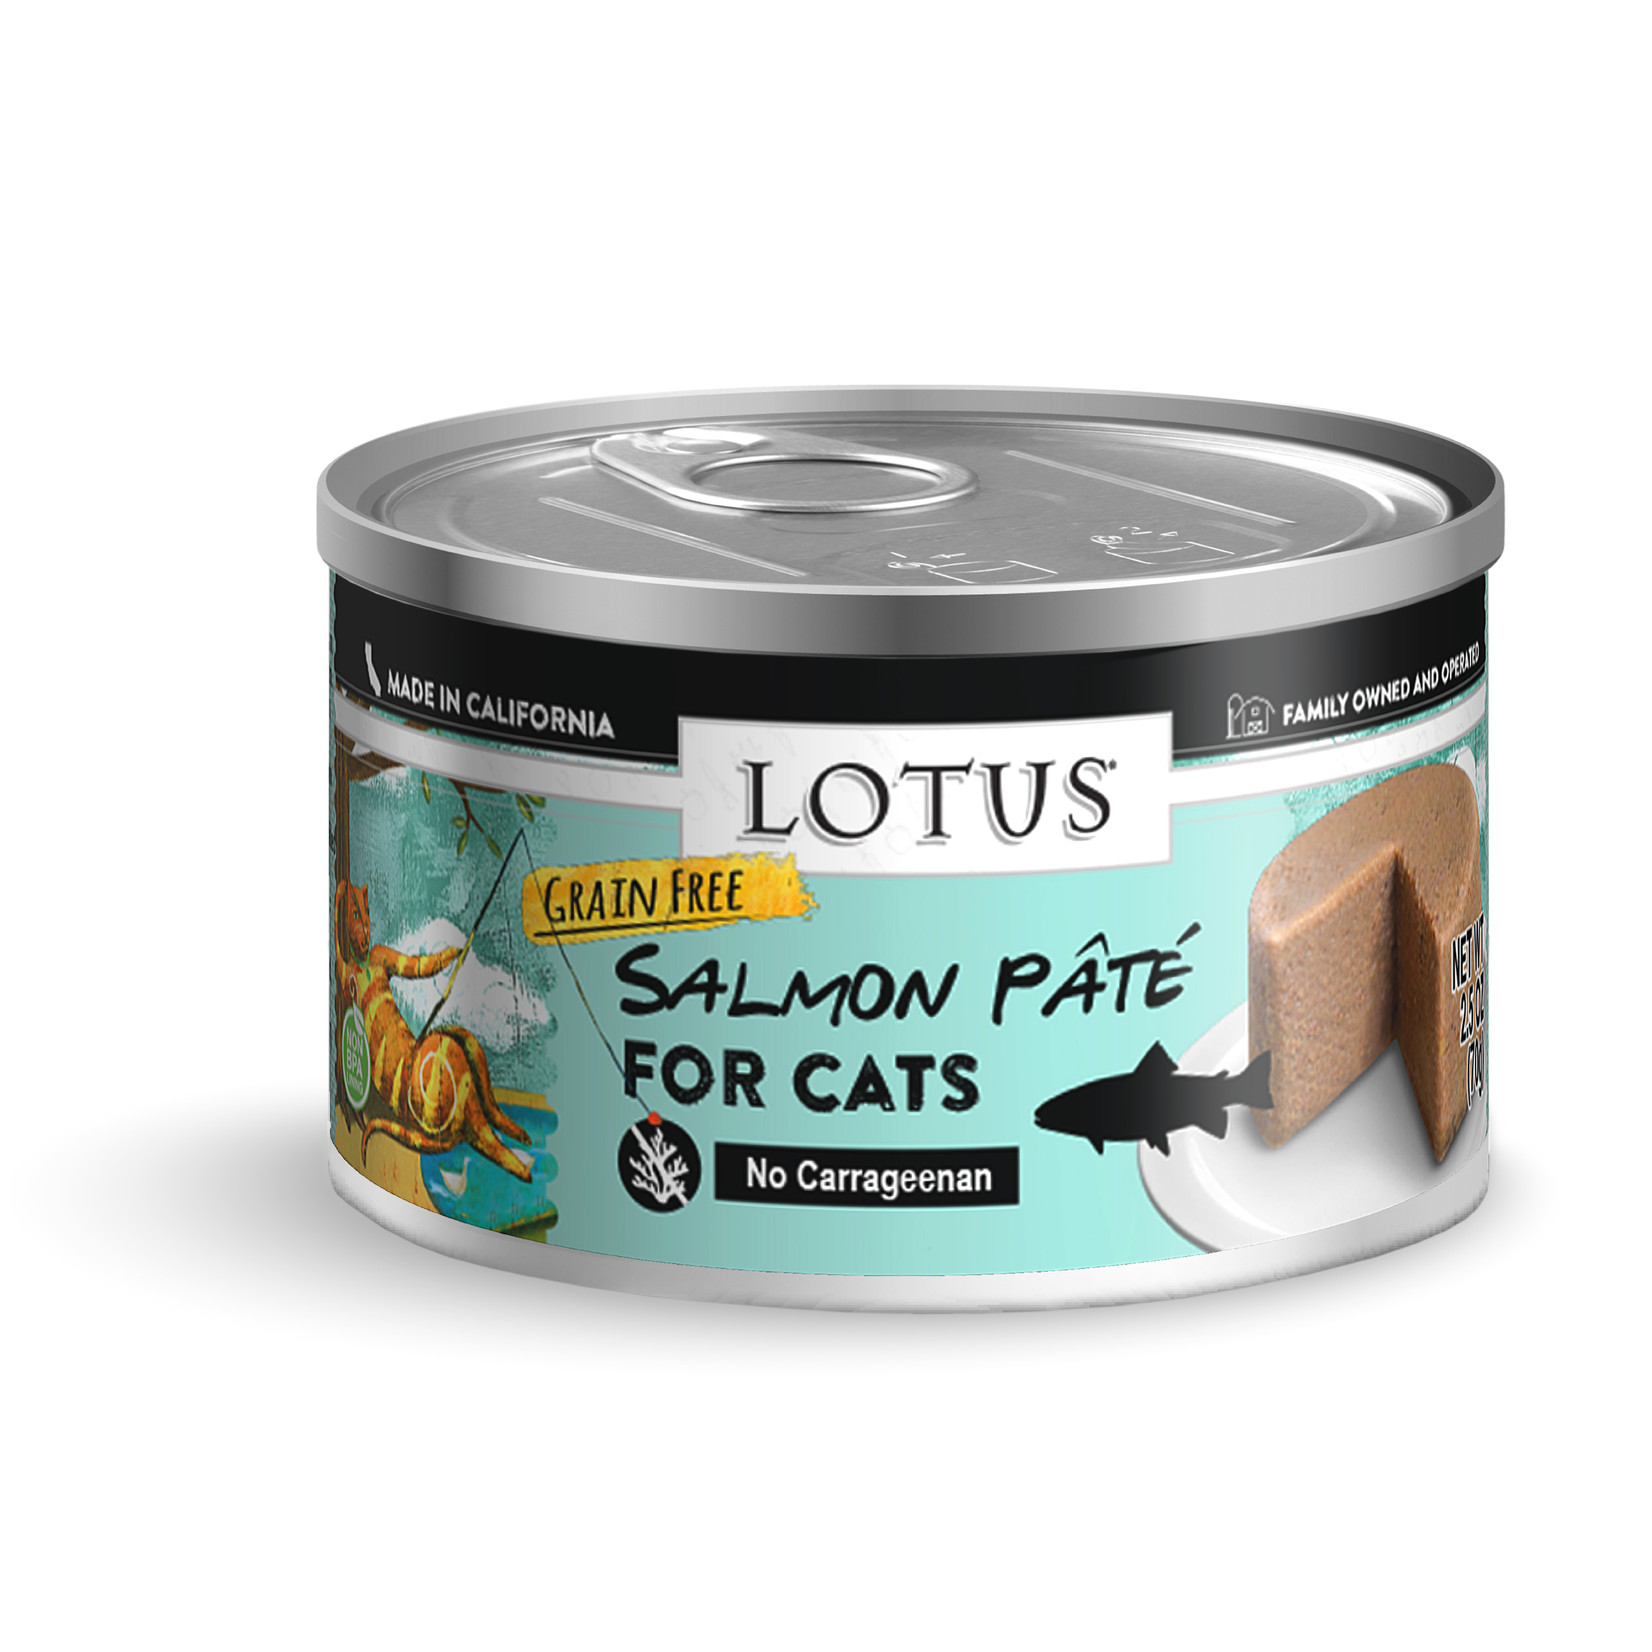 Lotus Lotus Salmon Pate Cat Canned Food 2.75oz